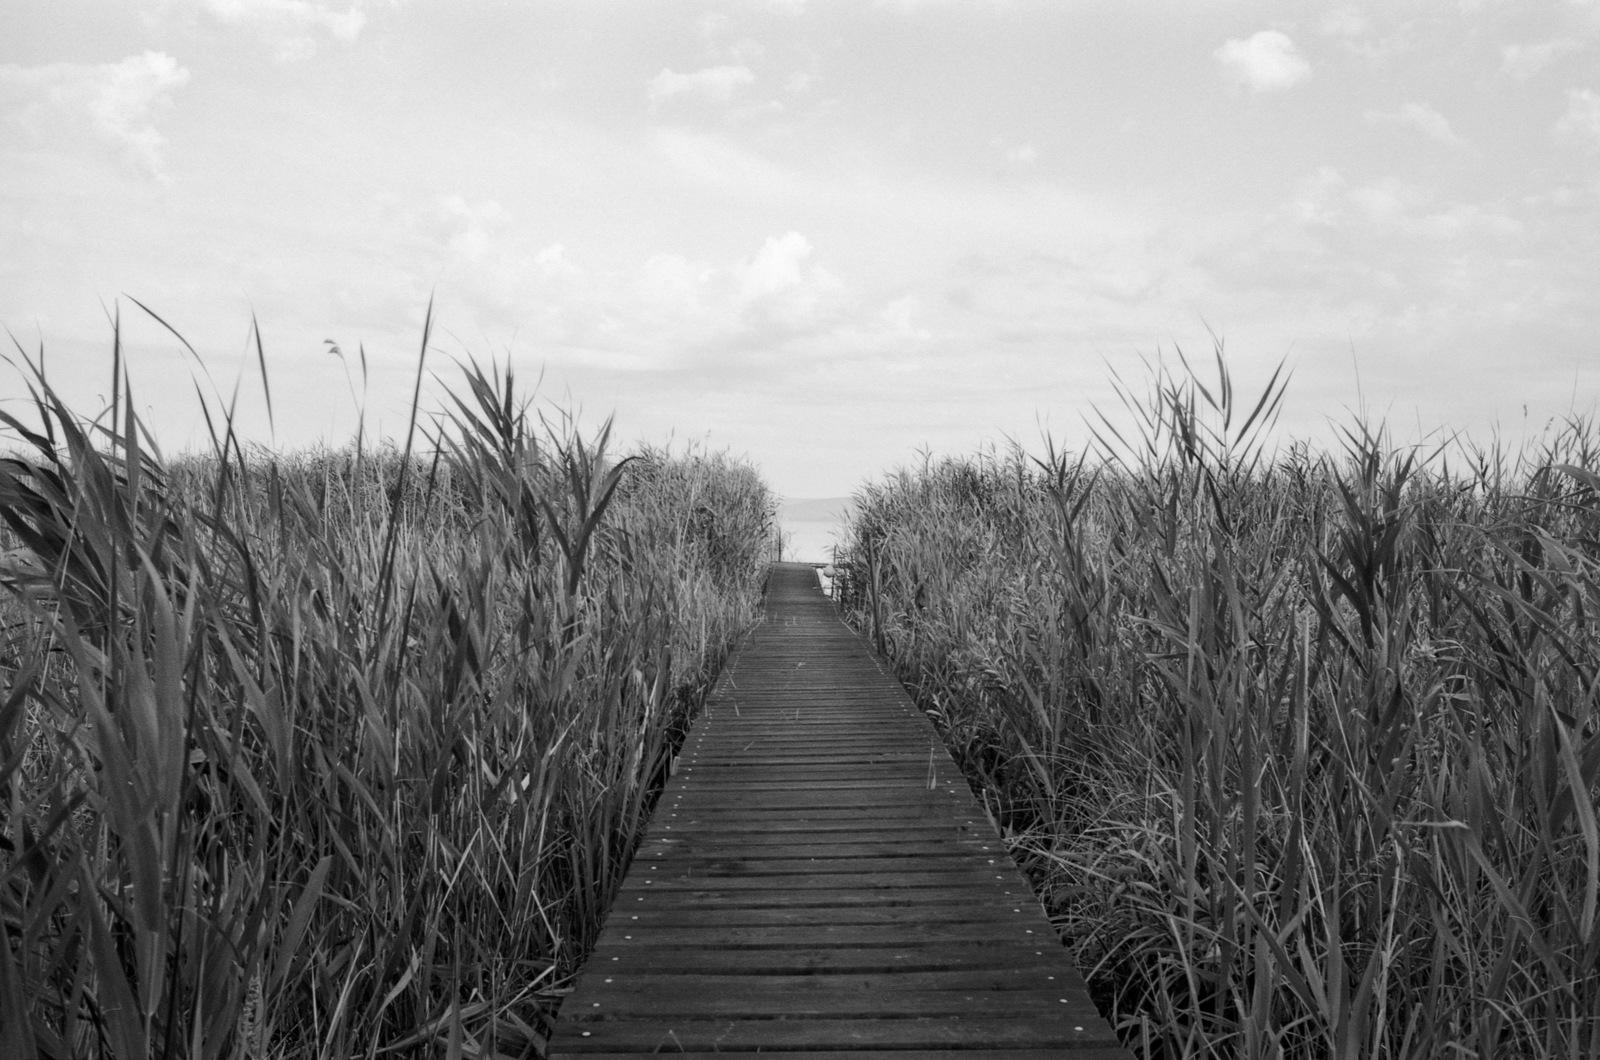 The end of the path... by Attila Farkas